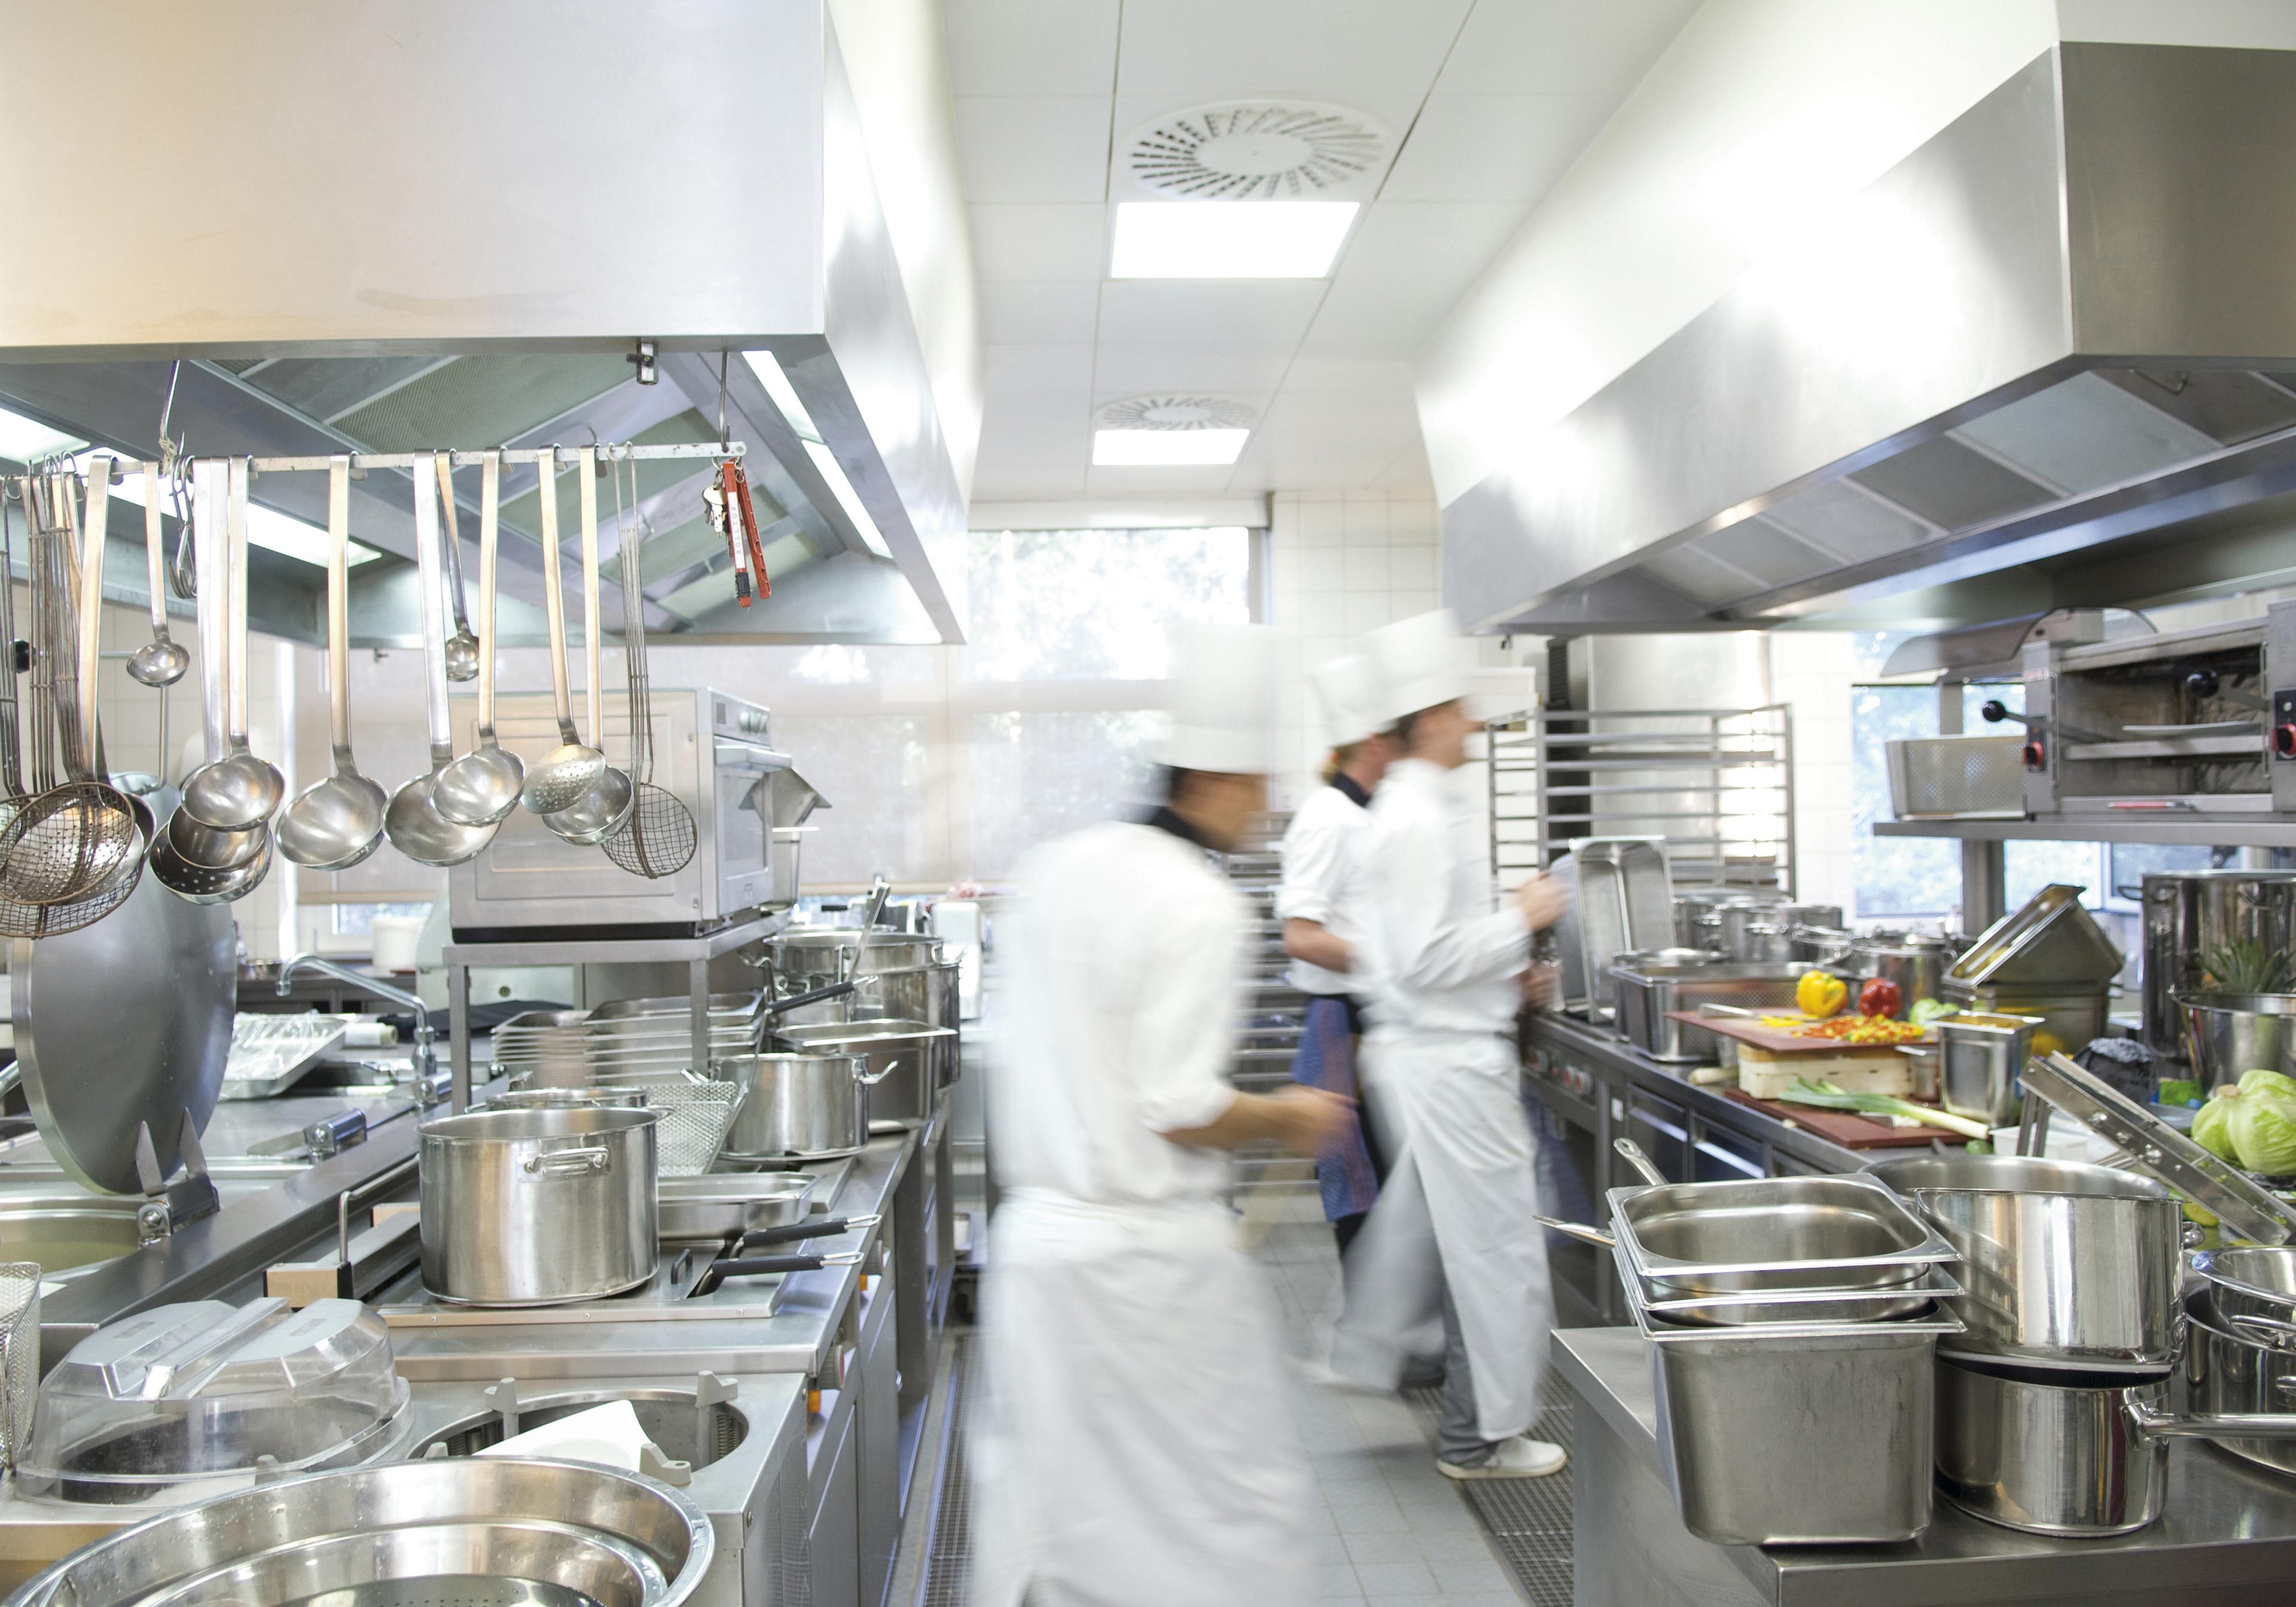 Kuhinja nekog restorana i kuhari